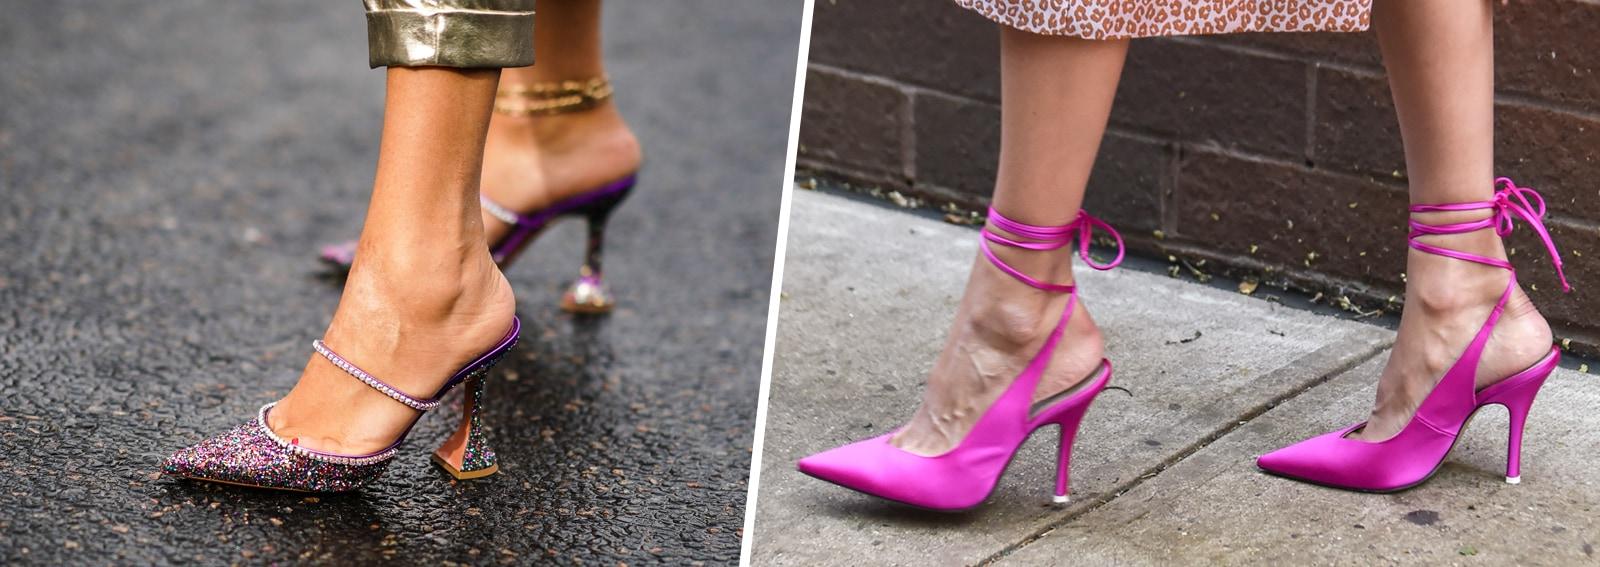 DESKTOP_scarpe_feste